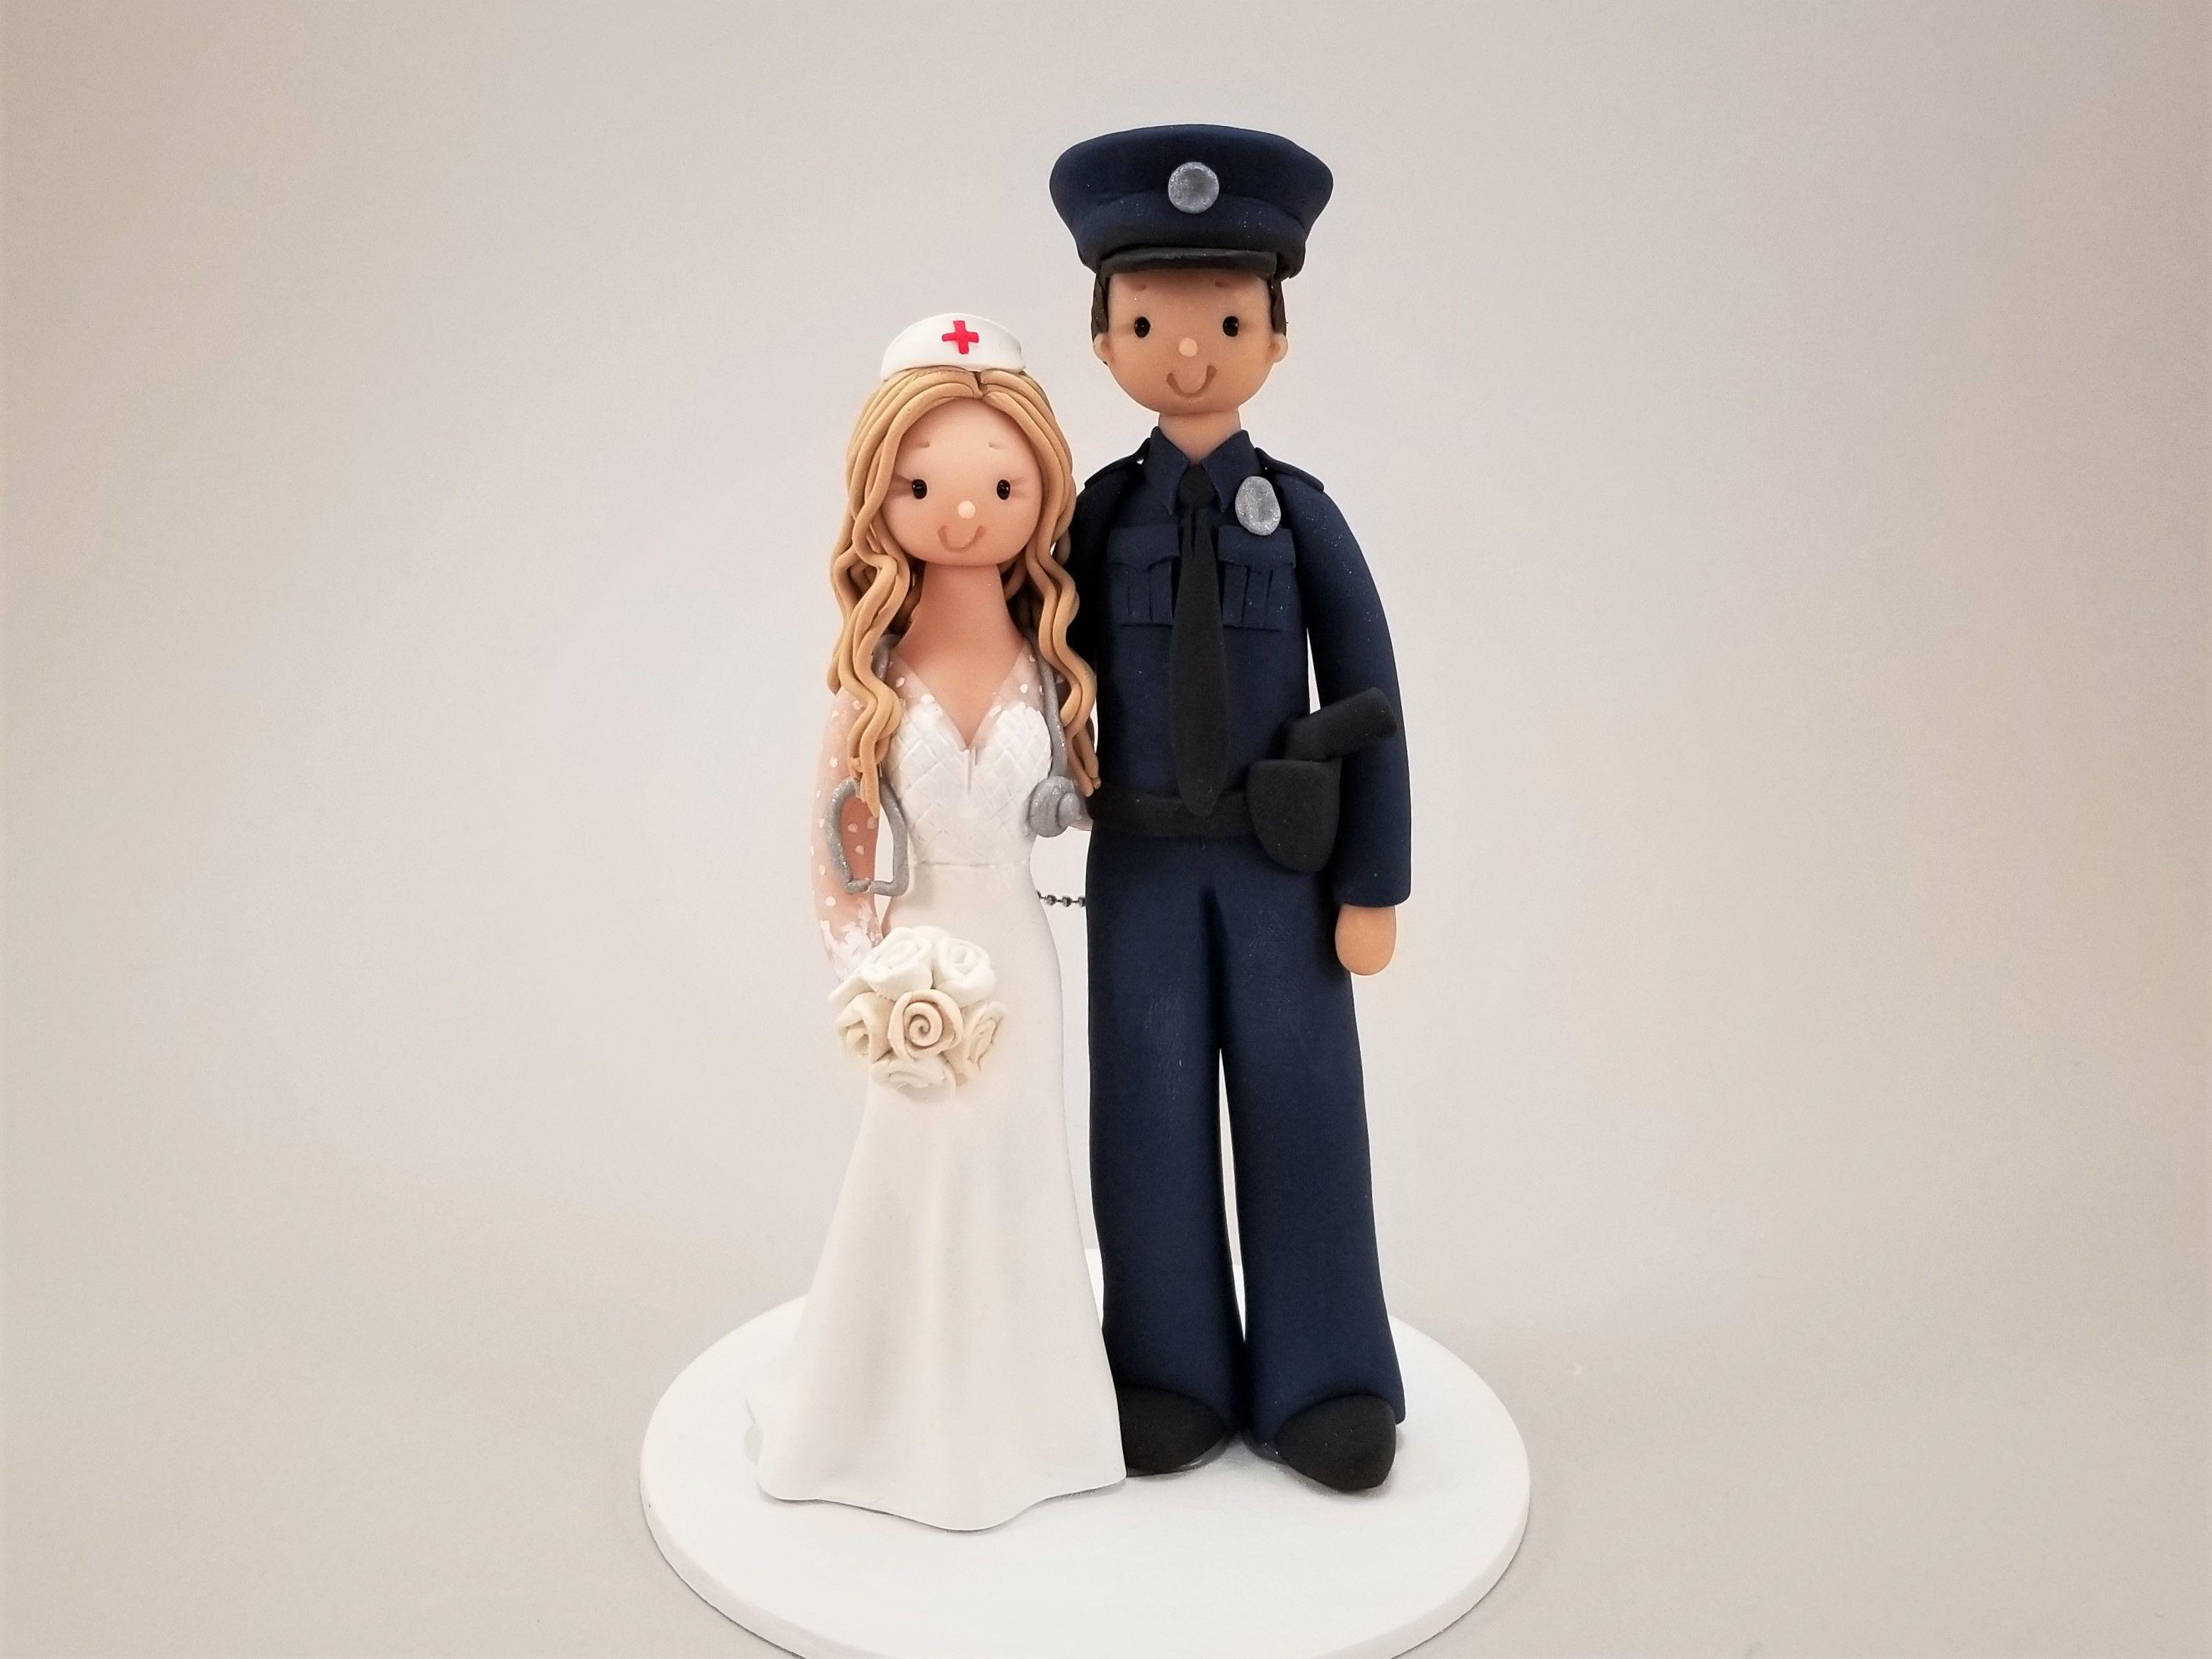 Police Officer Nurse Custom Handmade Wedding Cake Topper By